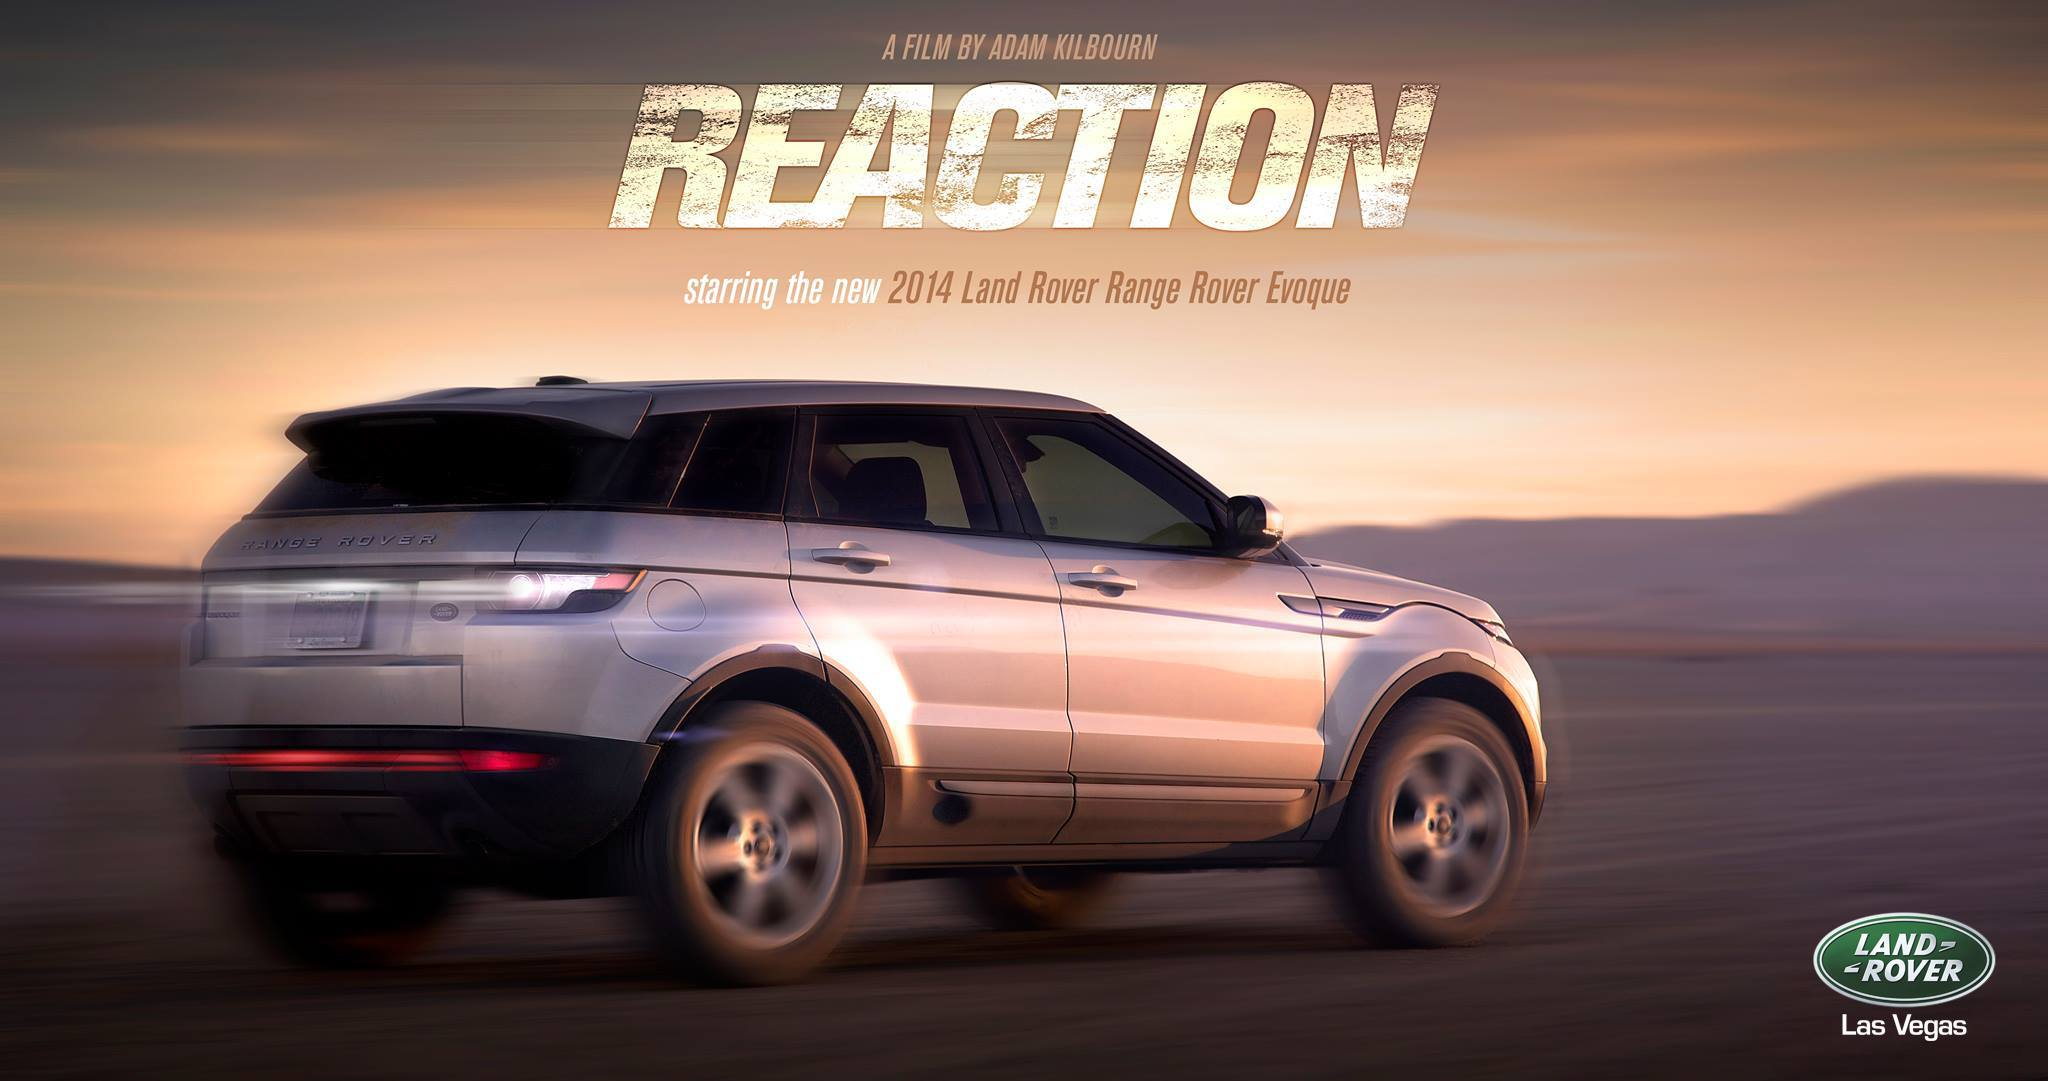 ReAction - Land Rover Poster